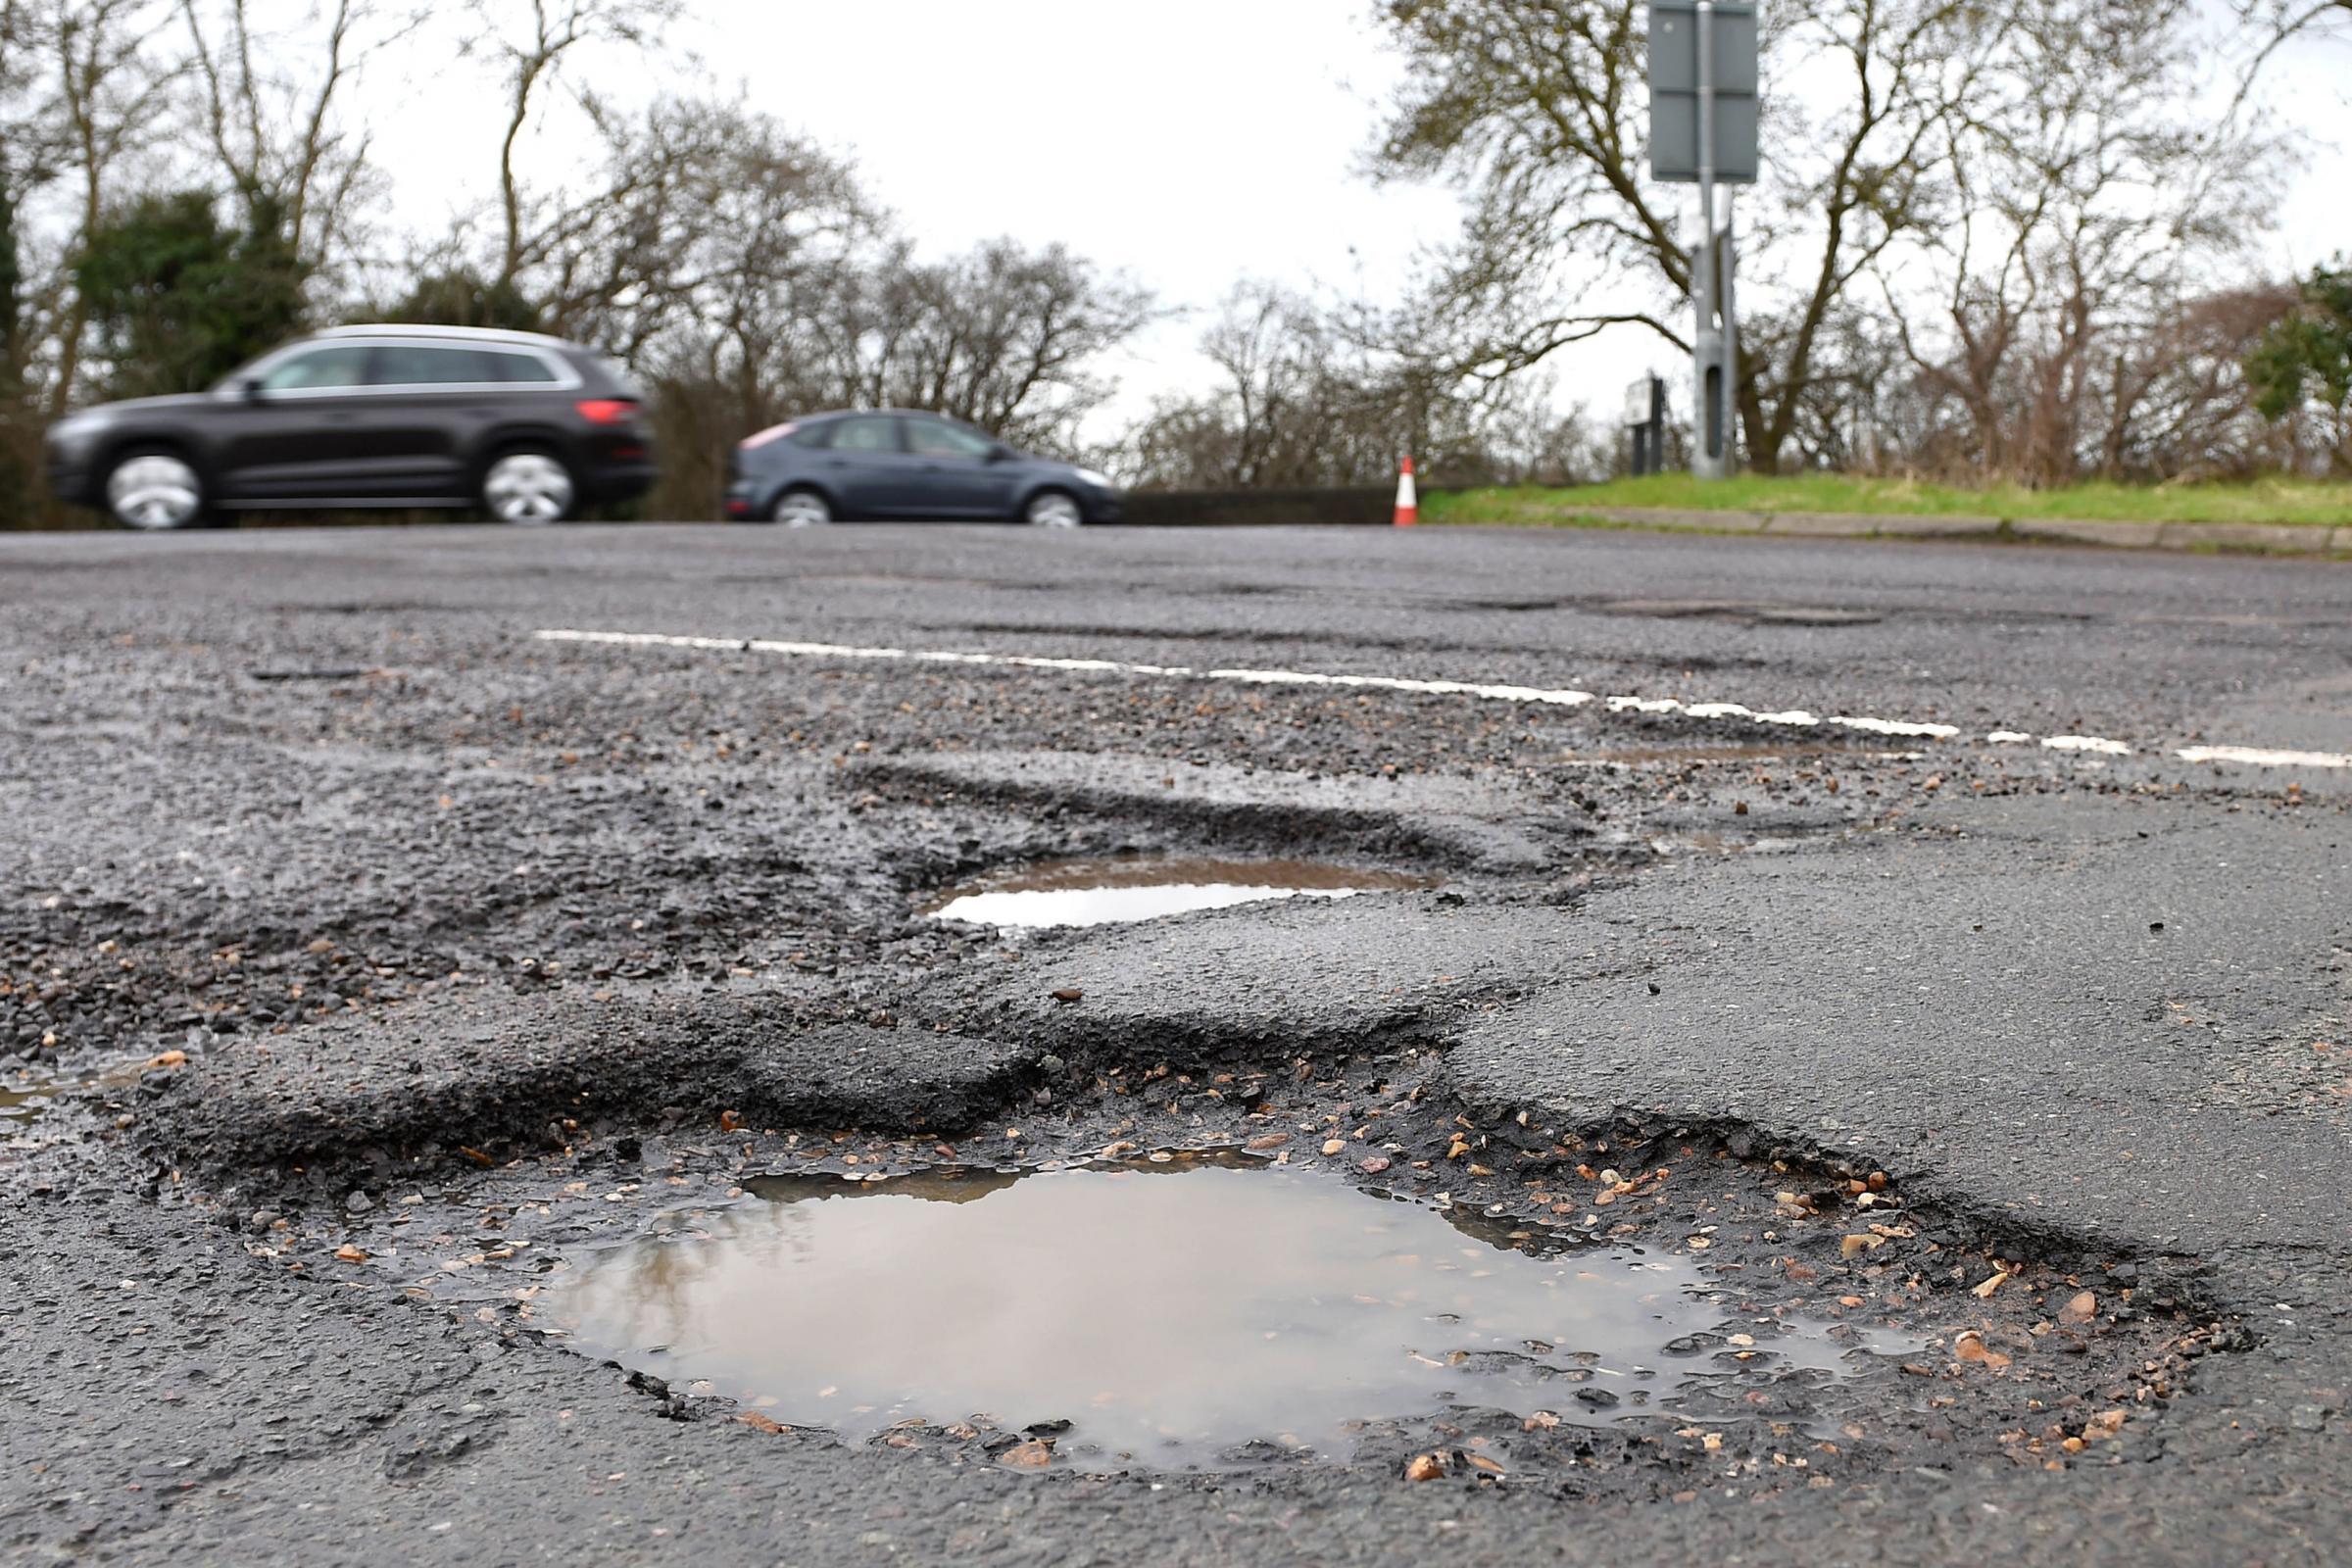 6c46f1c4d044 More than half a million potholes reported last year - Bury news ...